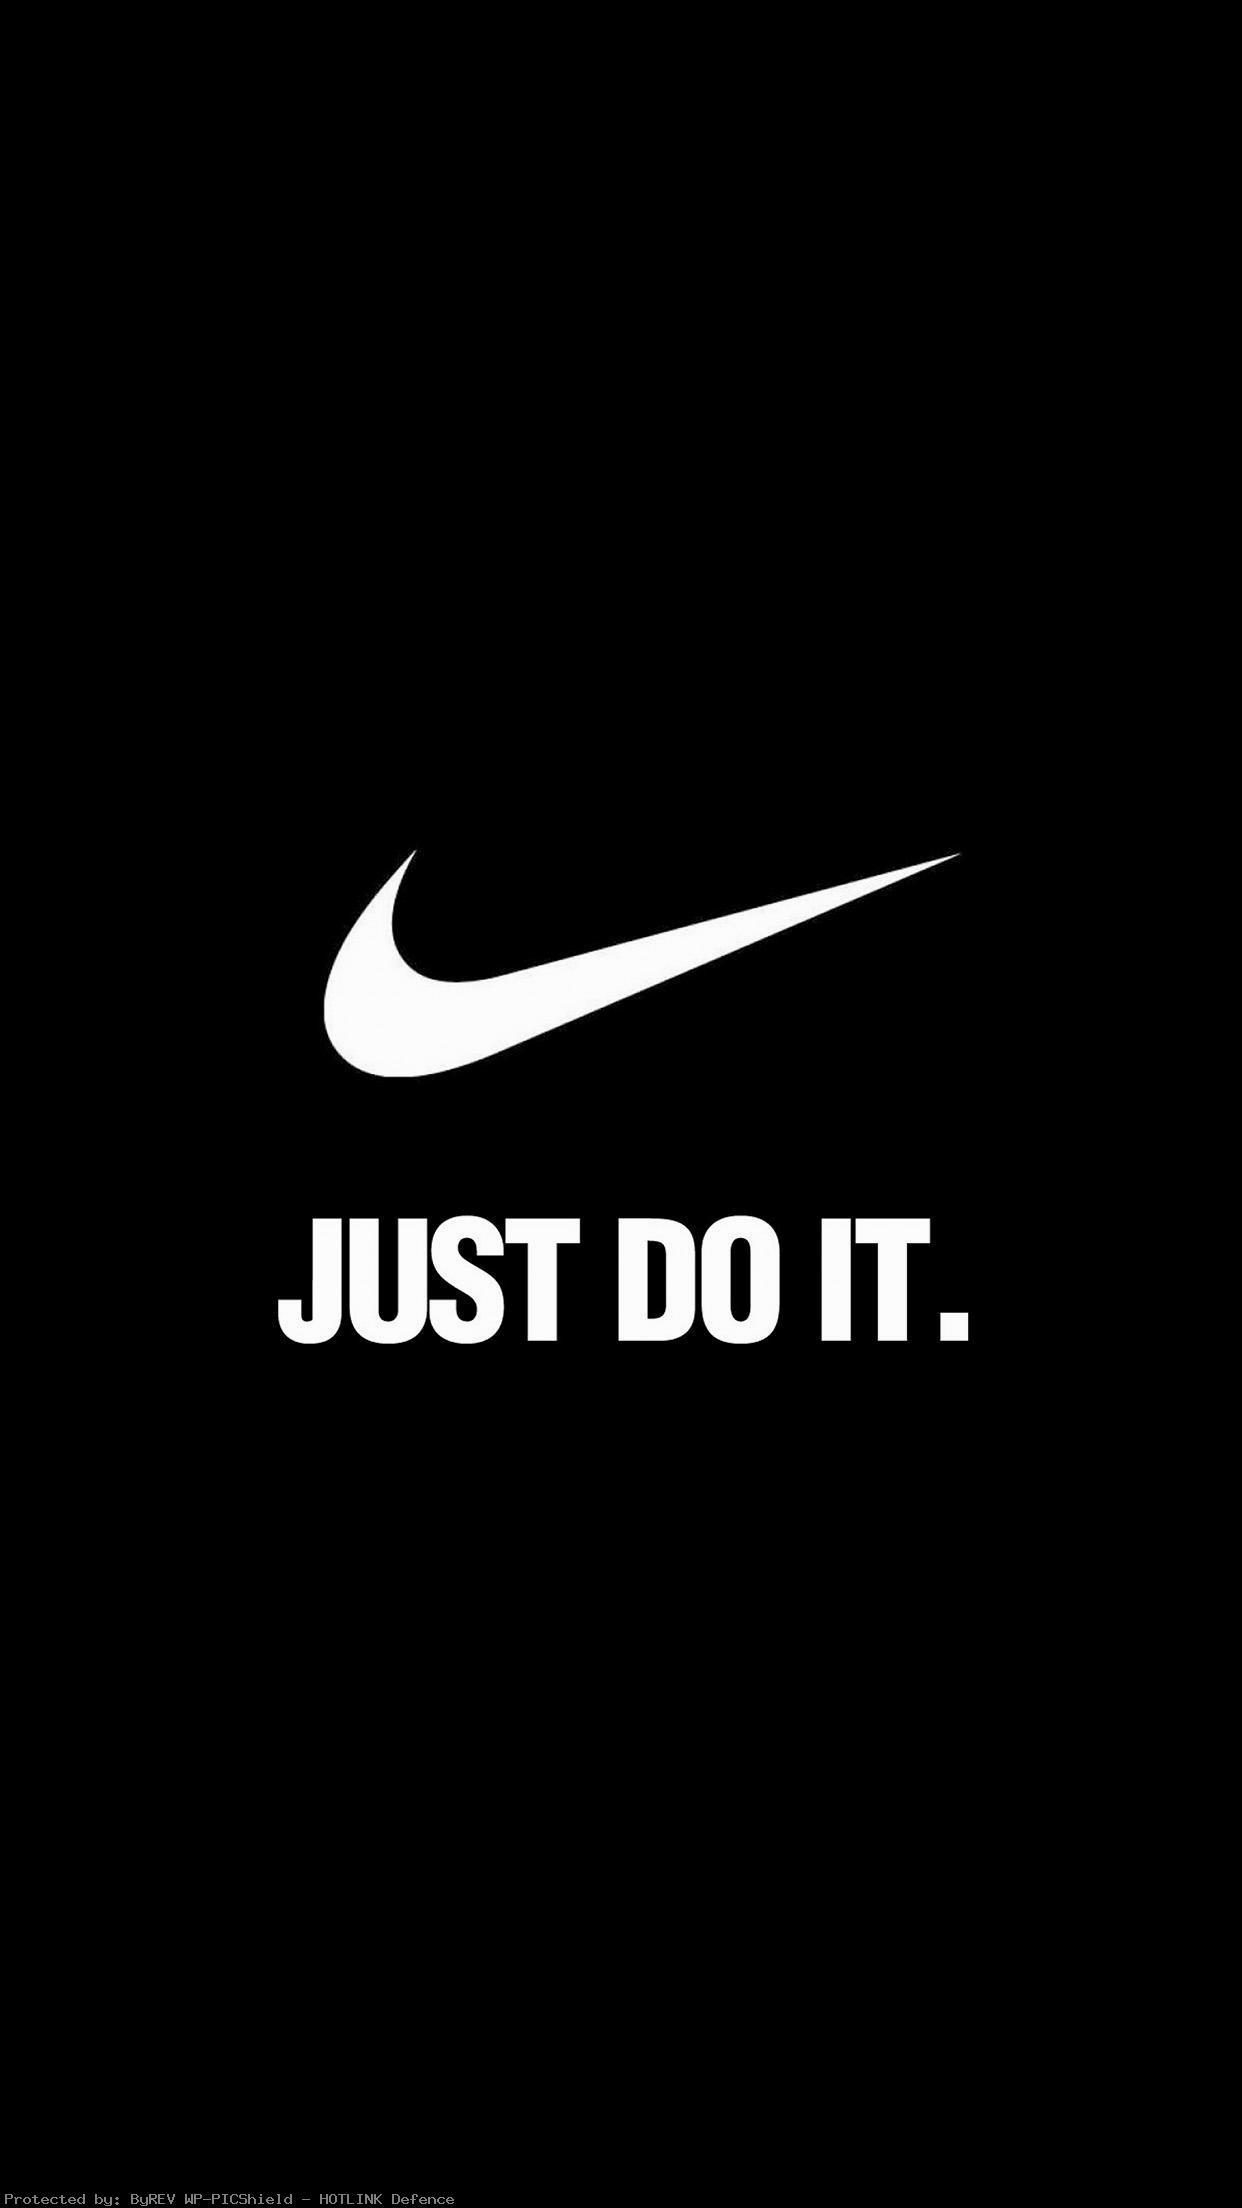 2200x1320 Nike Cj81 Calvin Johnson Wallpaper Player One 2200